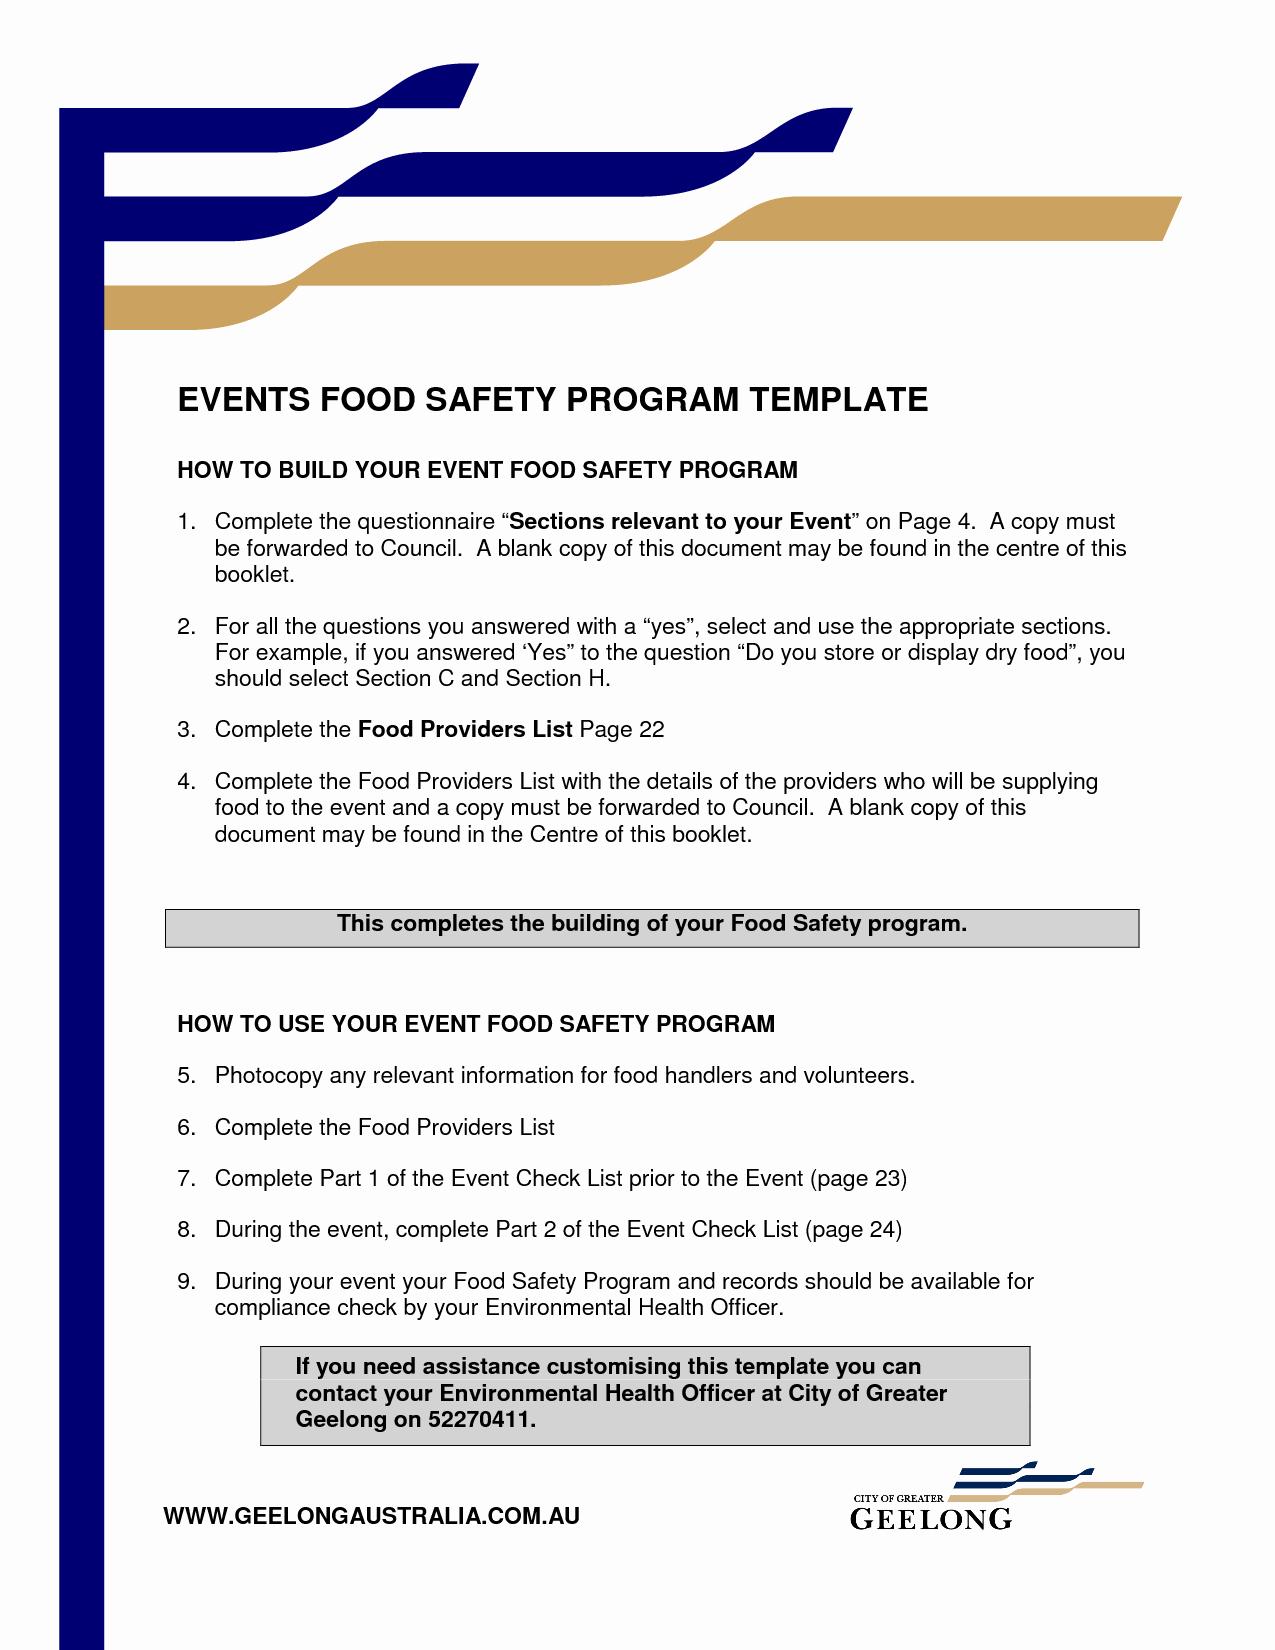 Event Program Template Word New event Program Template